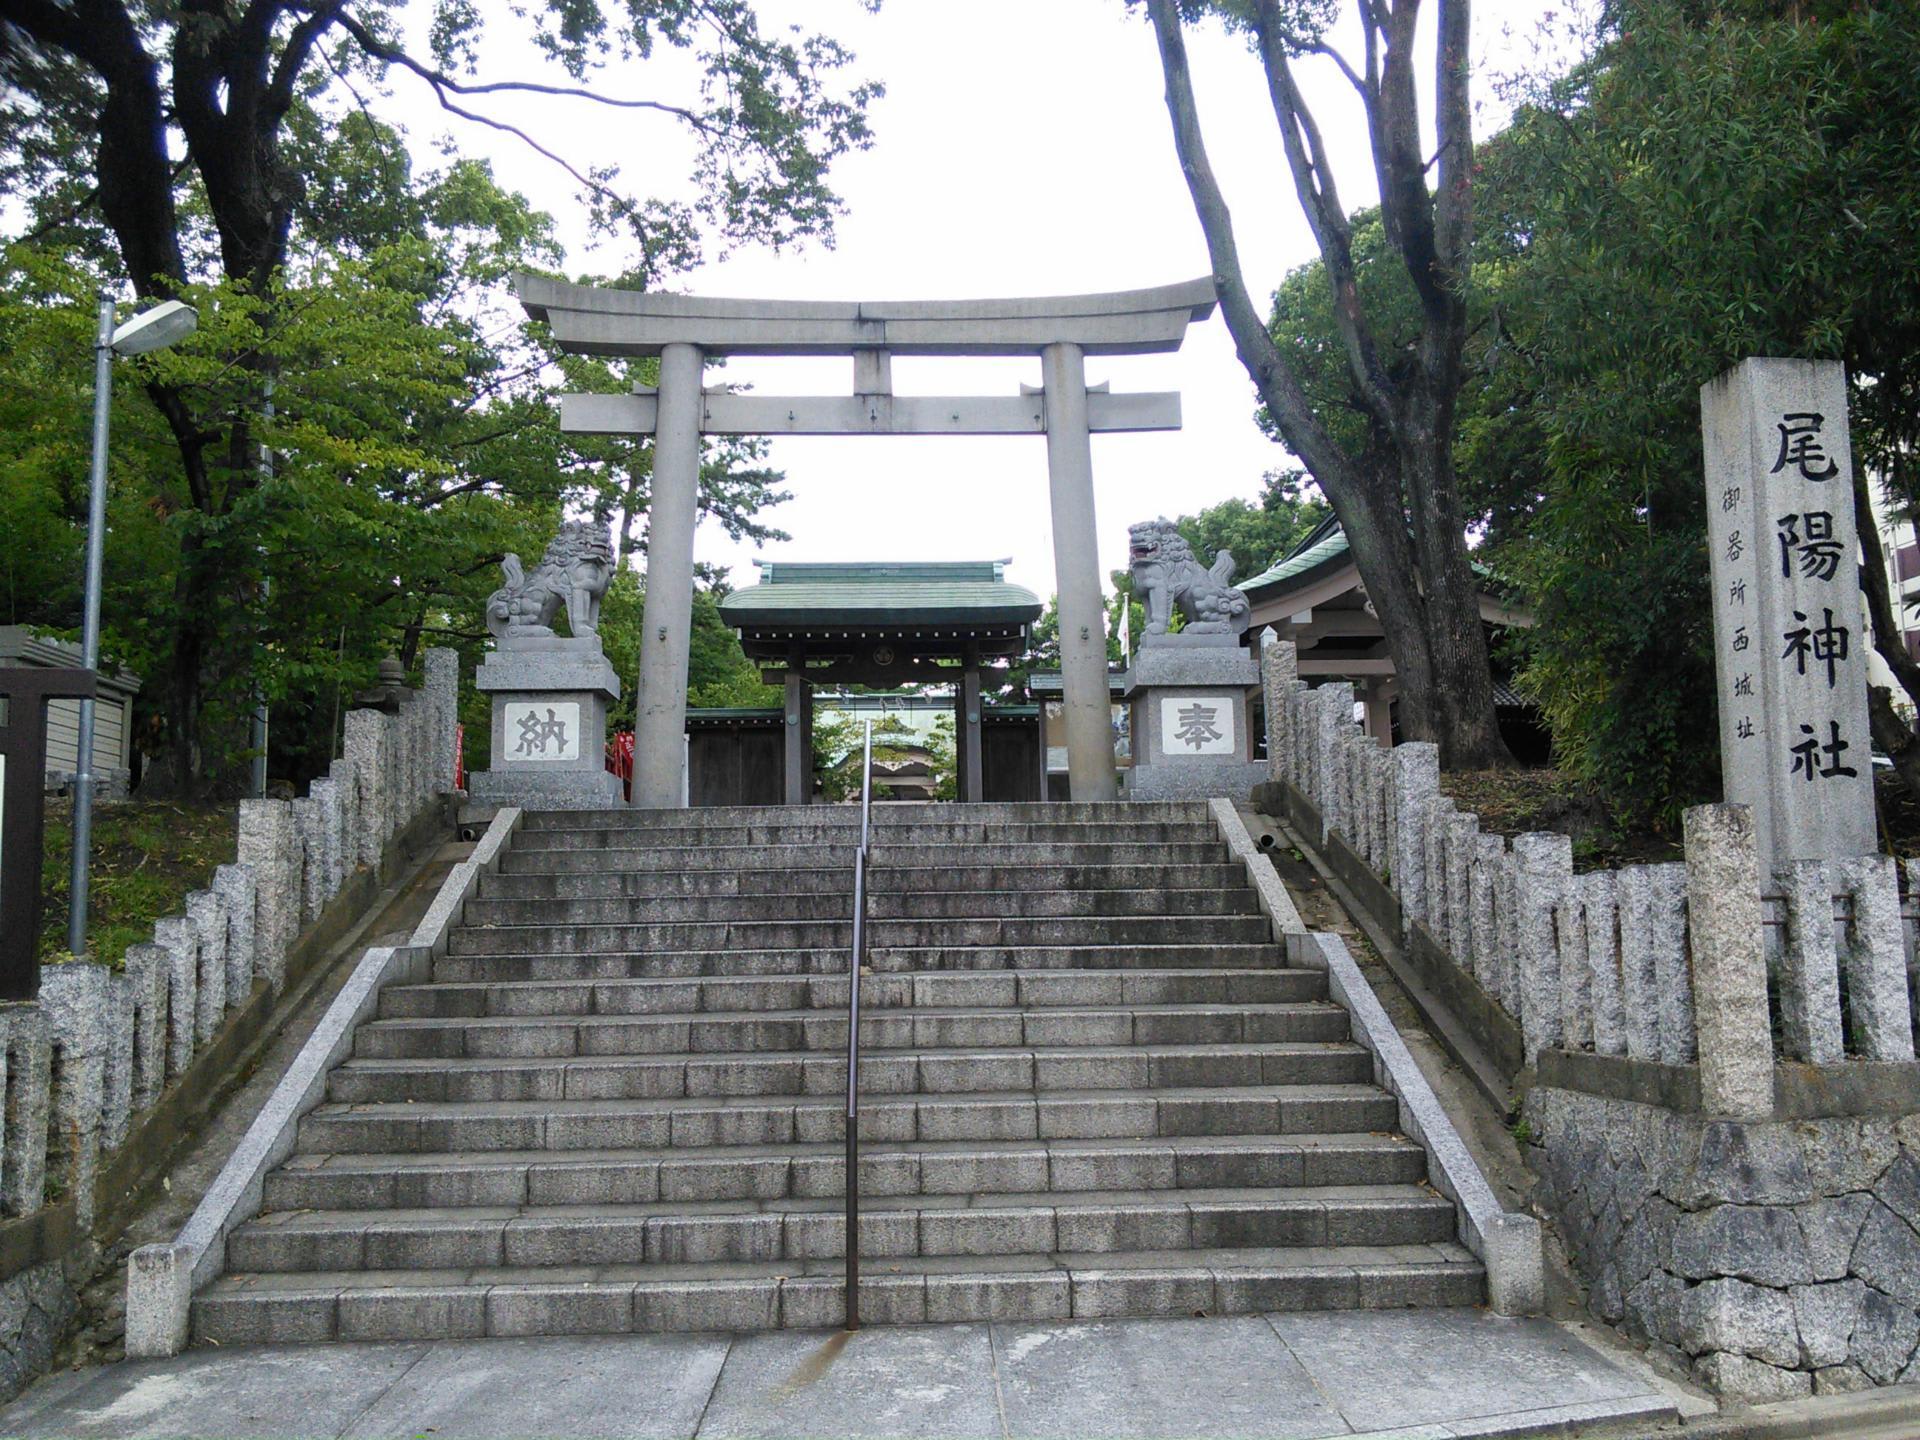 尾陽神社 - 名古屋の神社